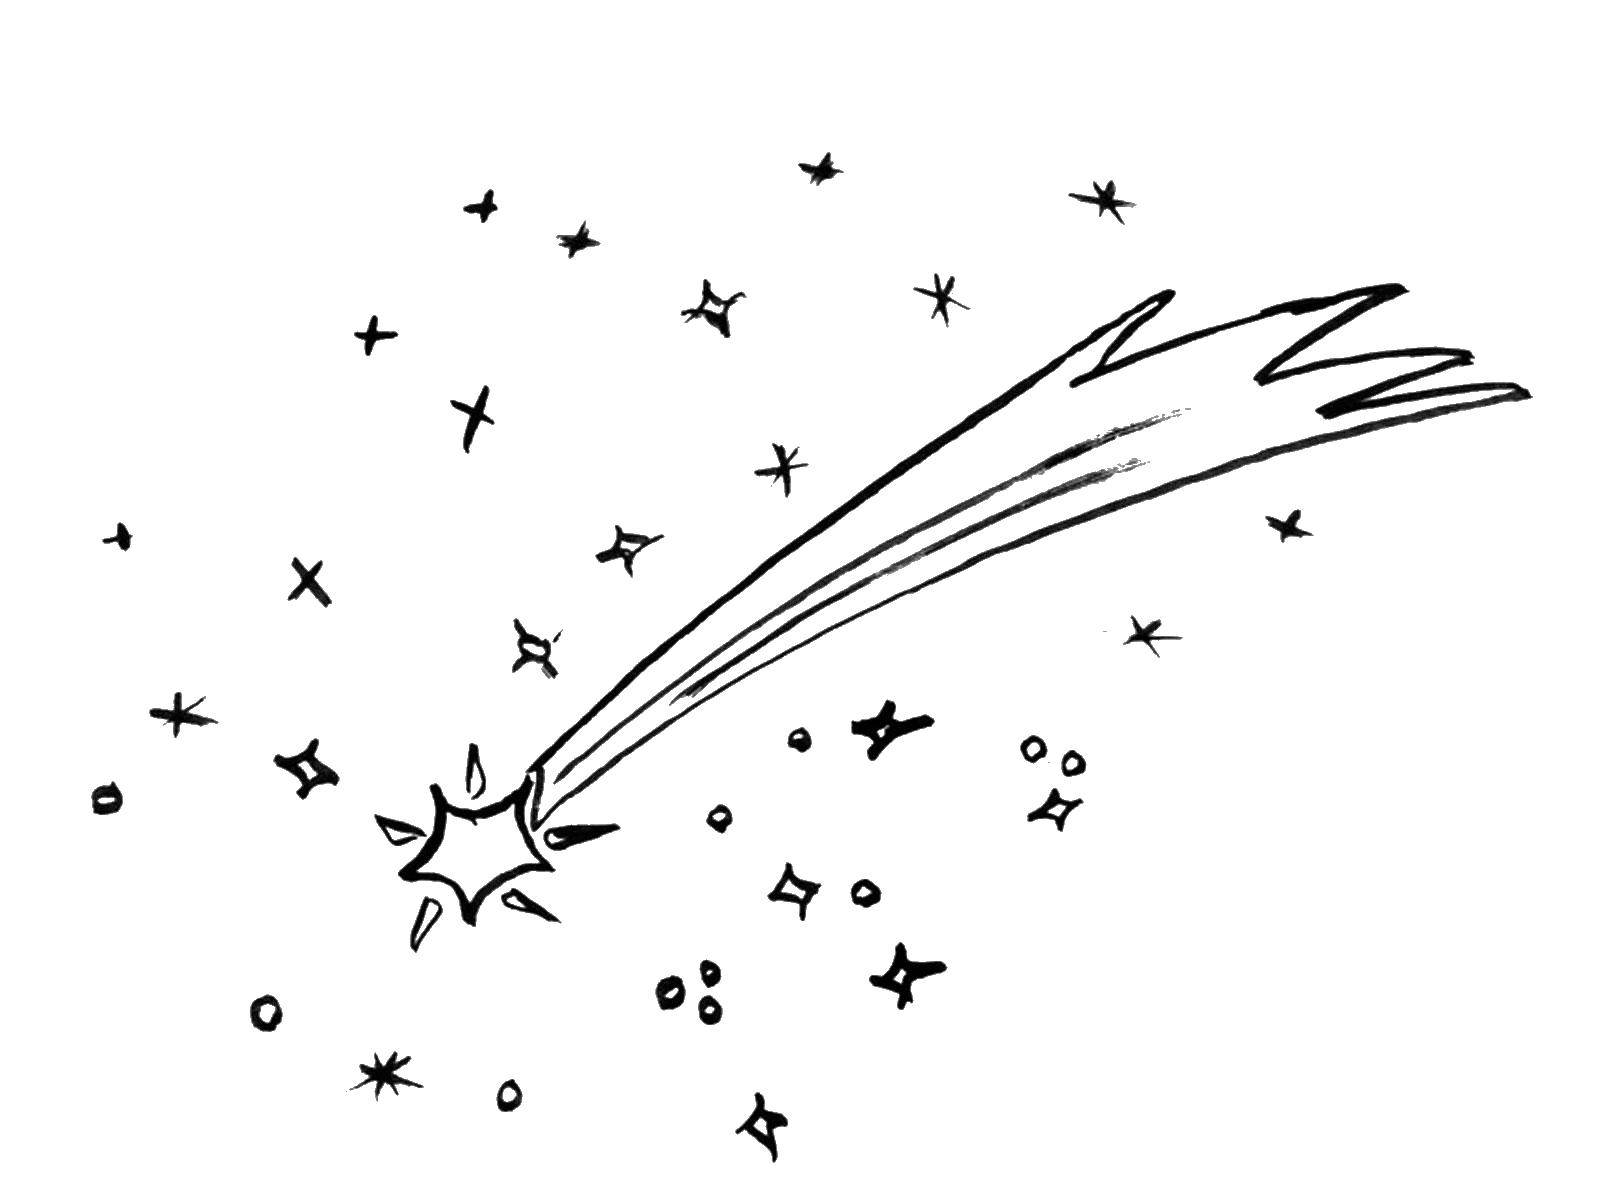 картинки спортивной тематики комета черно-белые